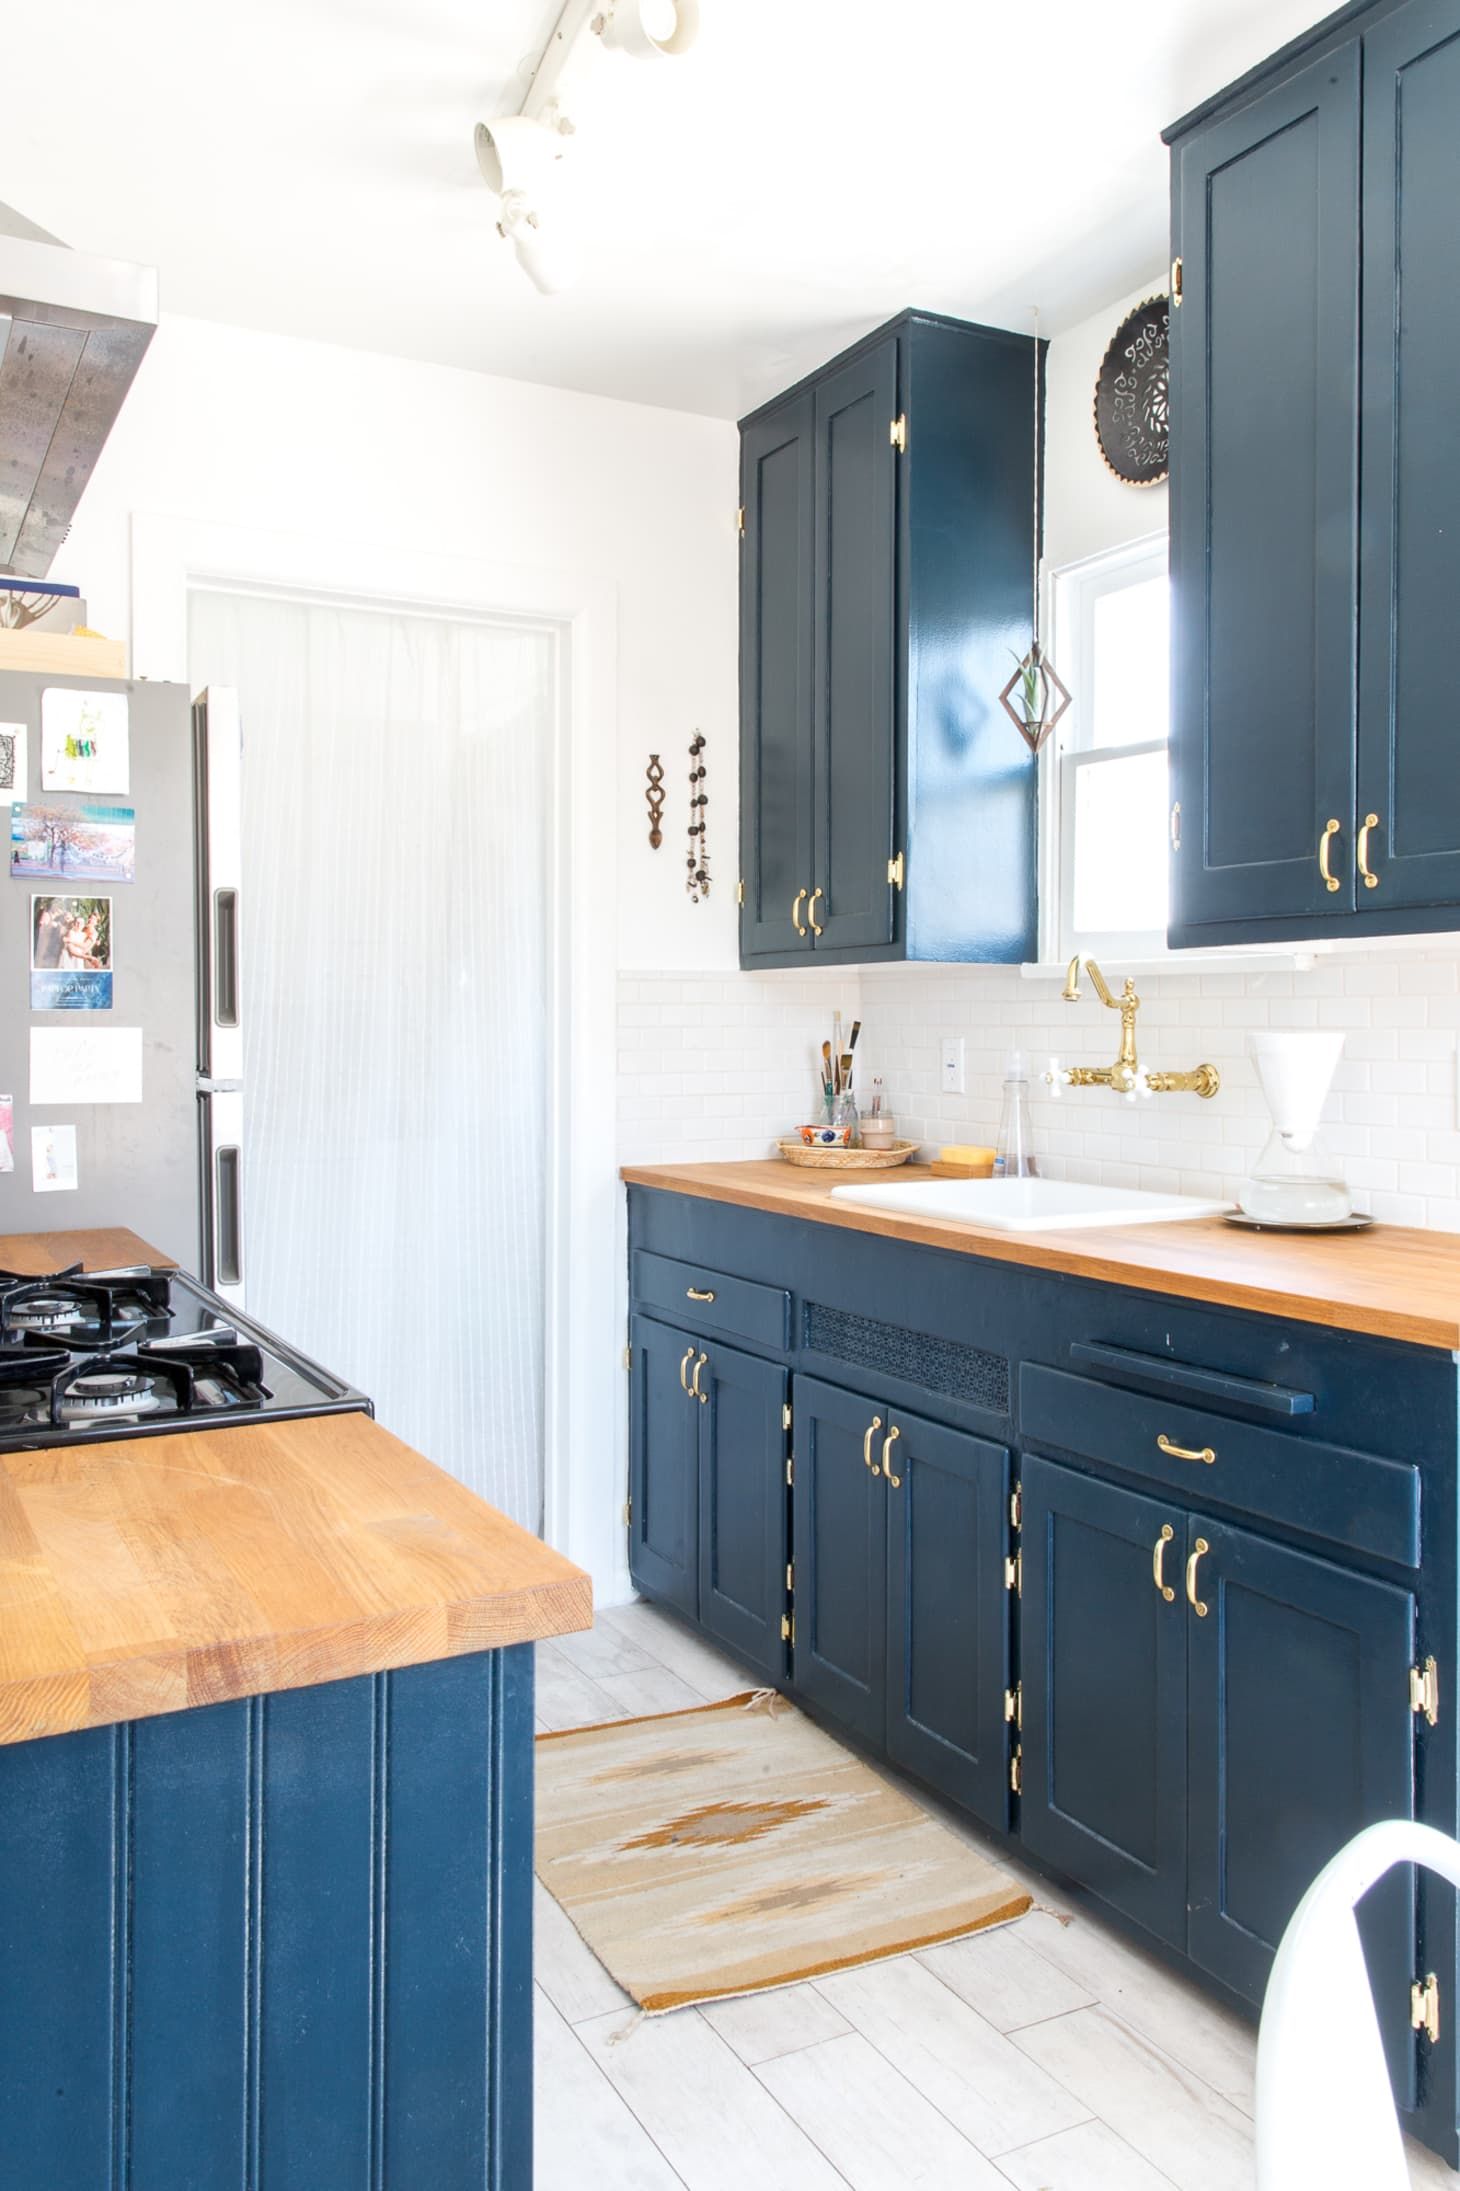 Kitchen Cabinet Soffit Space Ideas